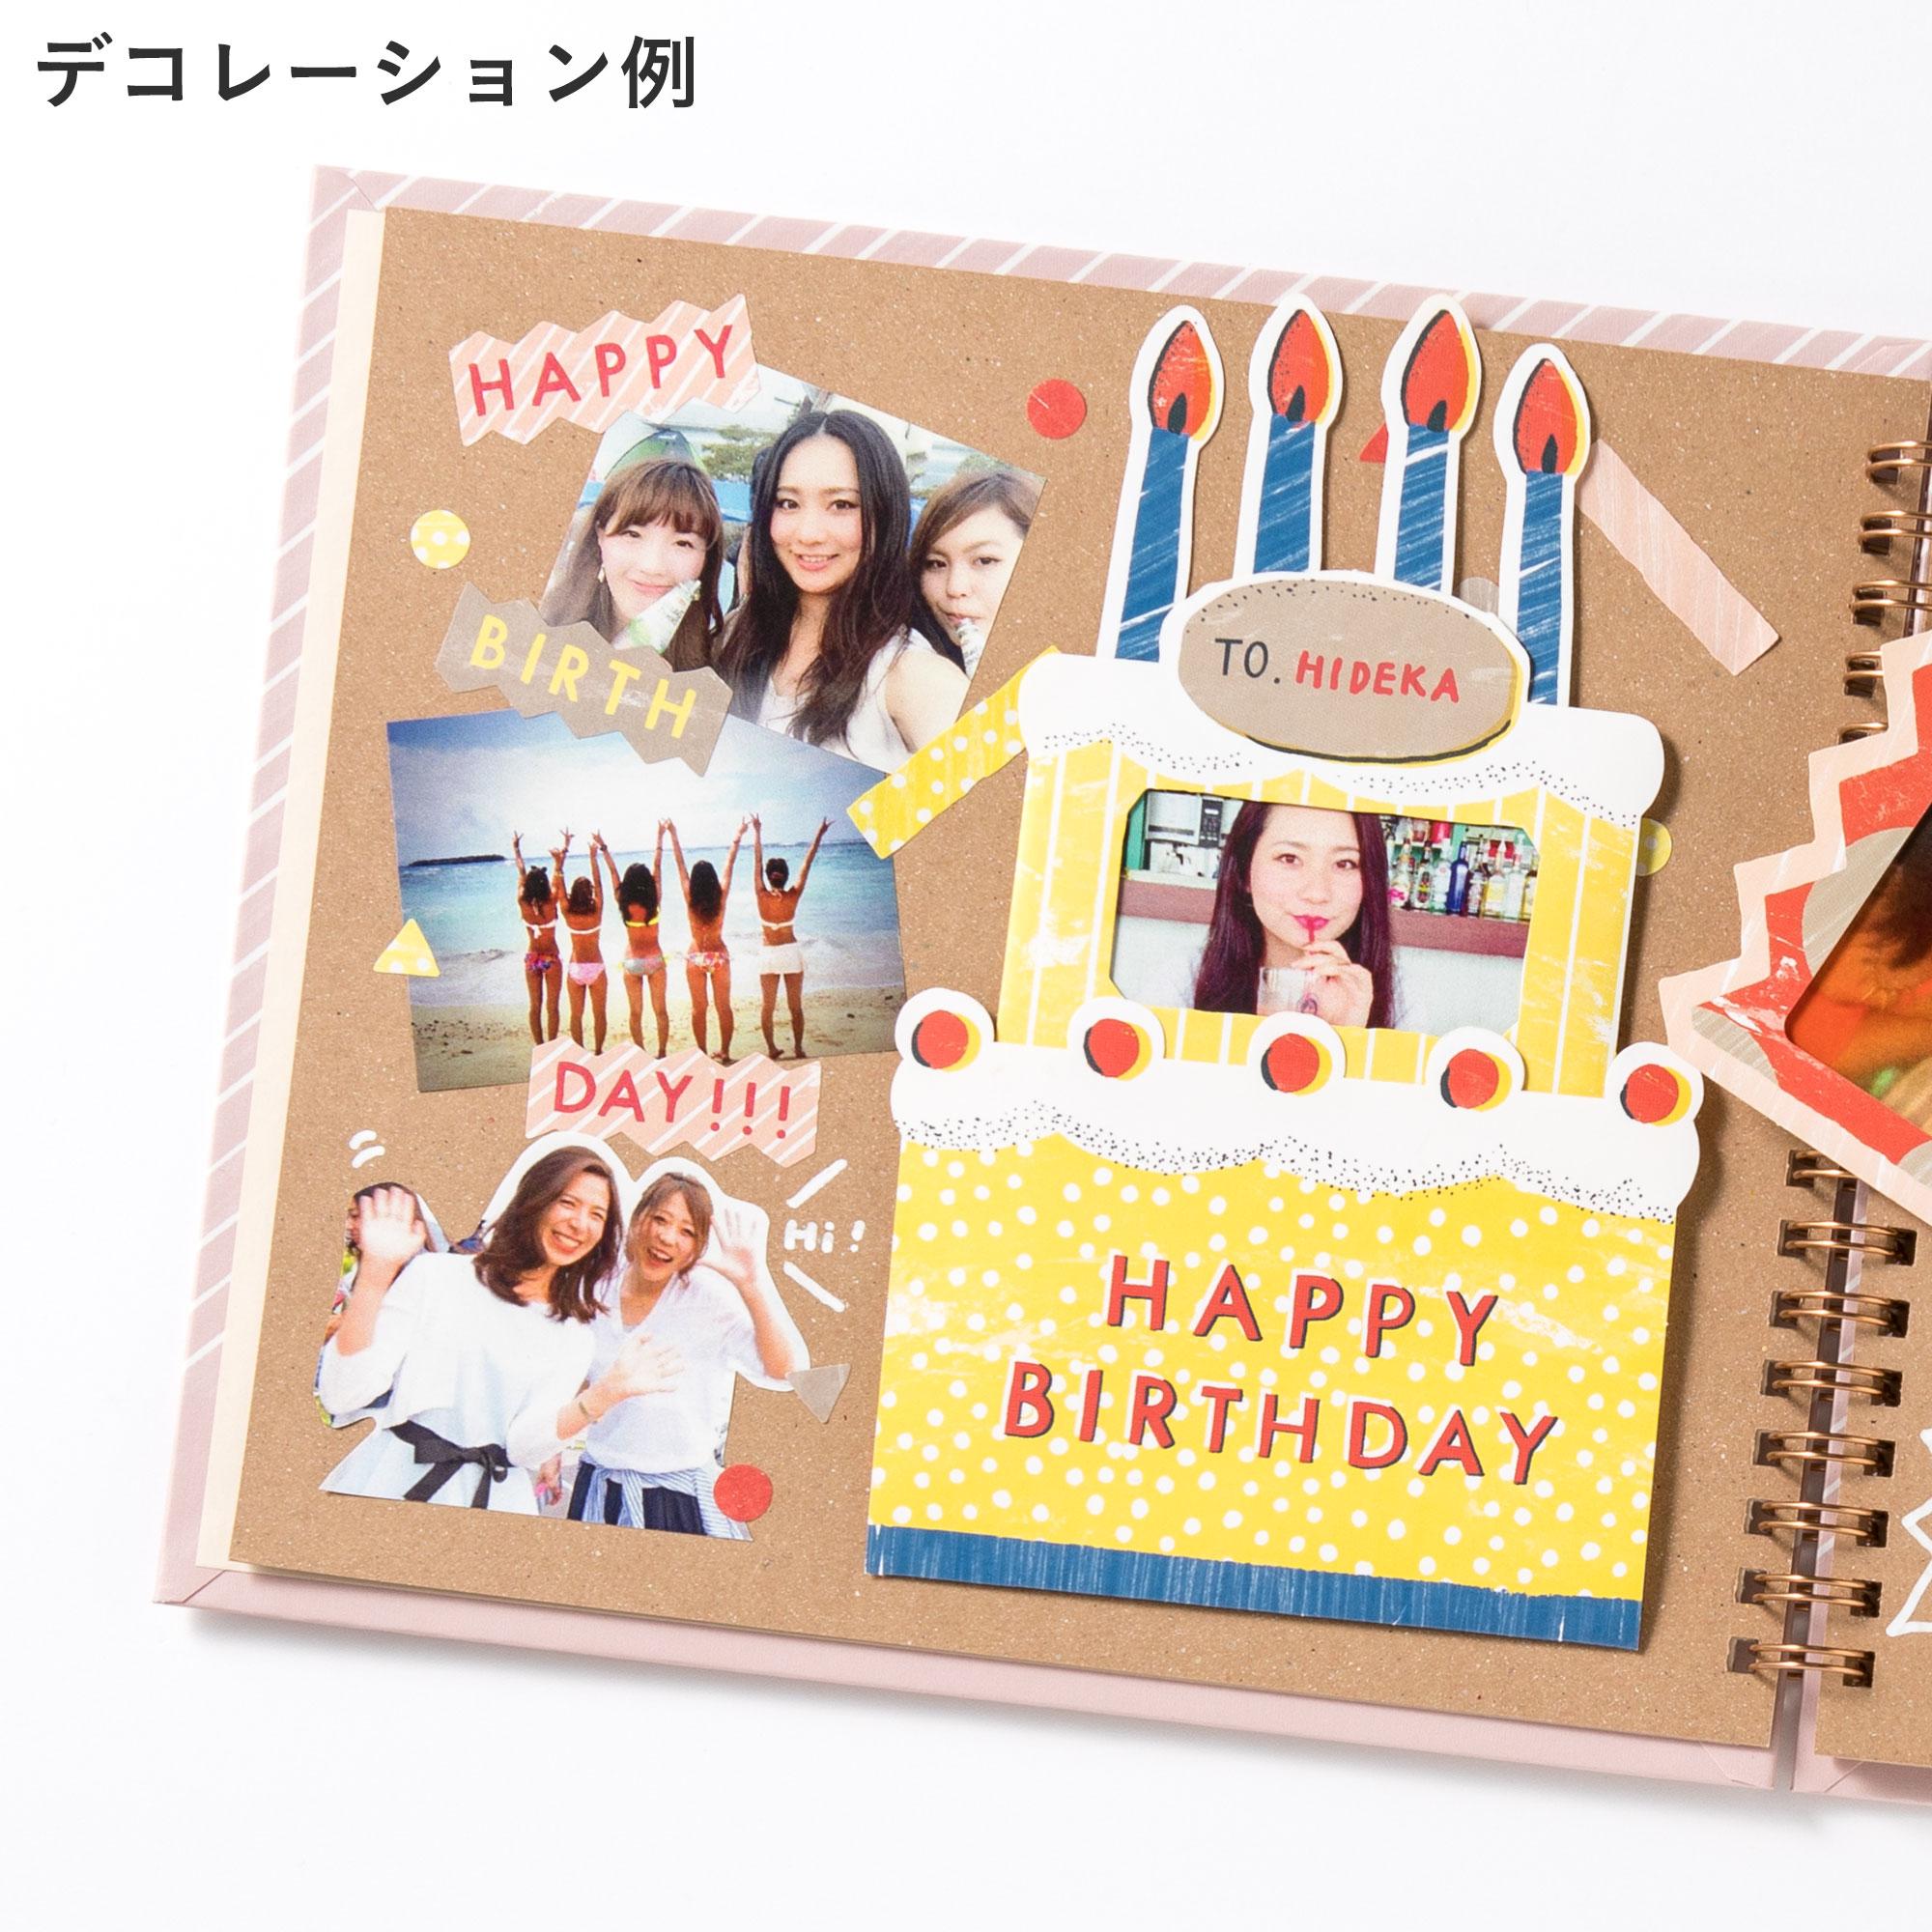 生日主題 Birthday Celebration